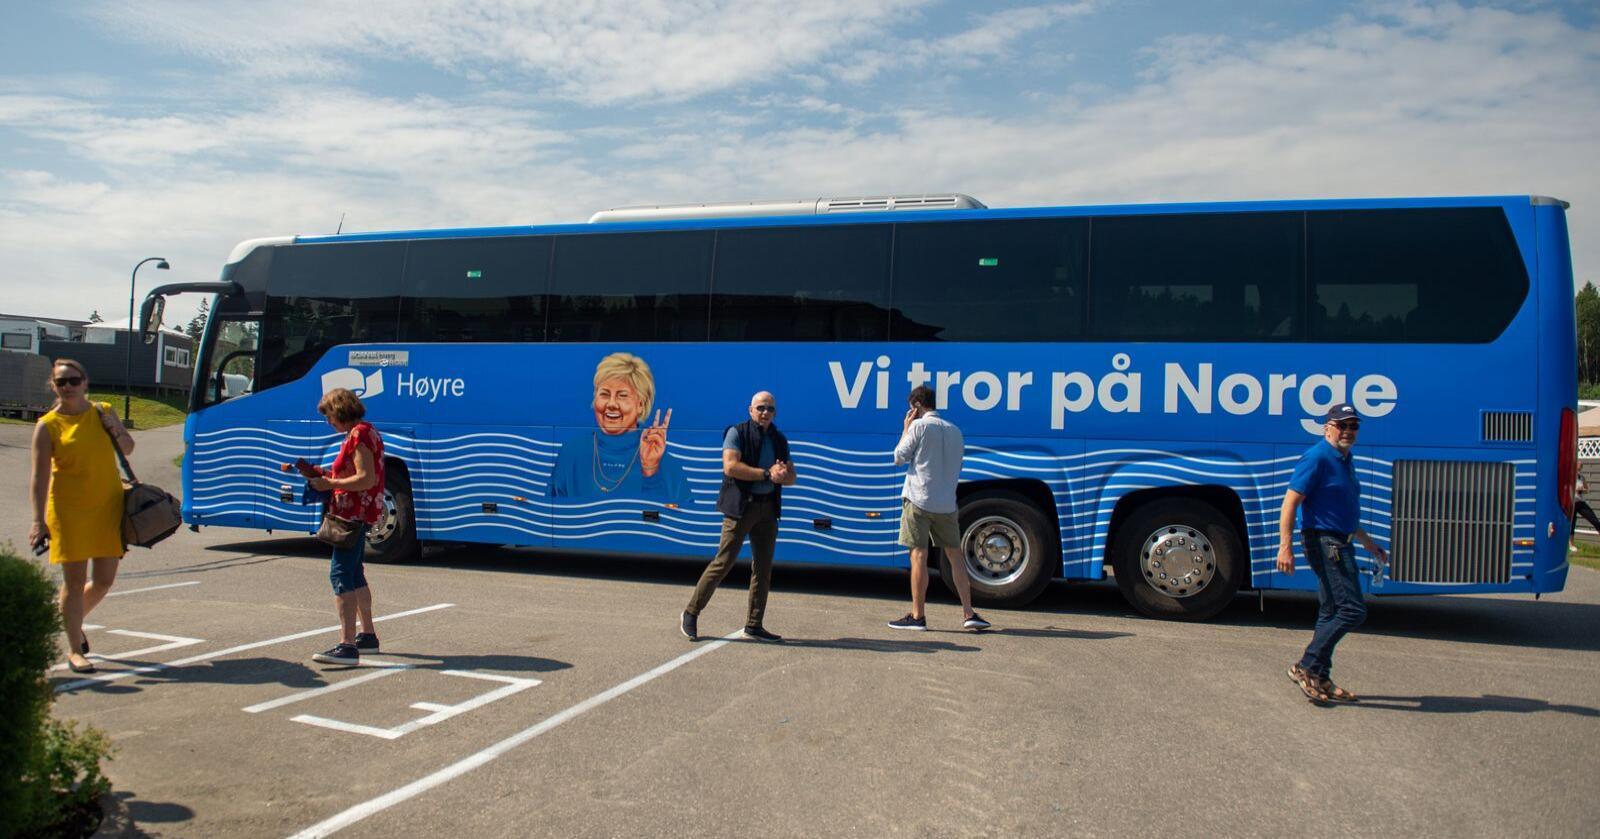 Høyres stortingskandidater over hele landet bør bli spurt om de deler Oslo Høyres synspunkter på «de utenfor Oslo», skriver Odd E. Rambøl. Her er Høyres kampanjebuss. Foto: Annika Byrde / NTB